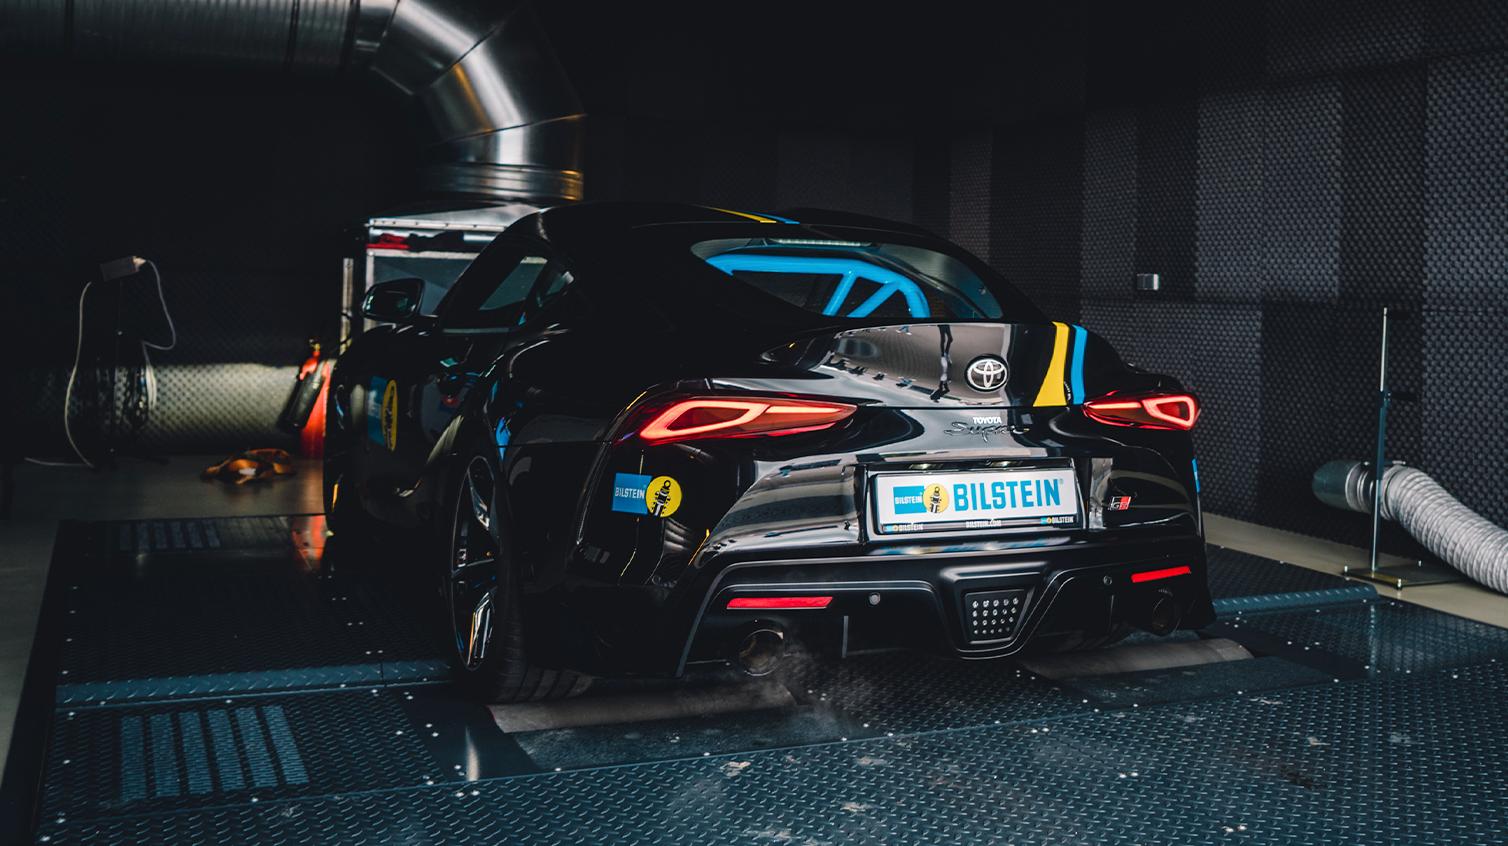 BILSTEIN Toyota Supra 2019 2020 2021 Tuning DB MK4 MK5 Tracktool Nürburgring